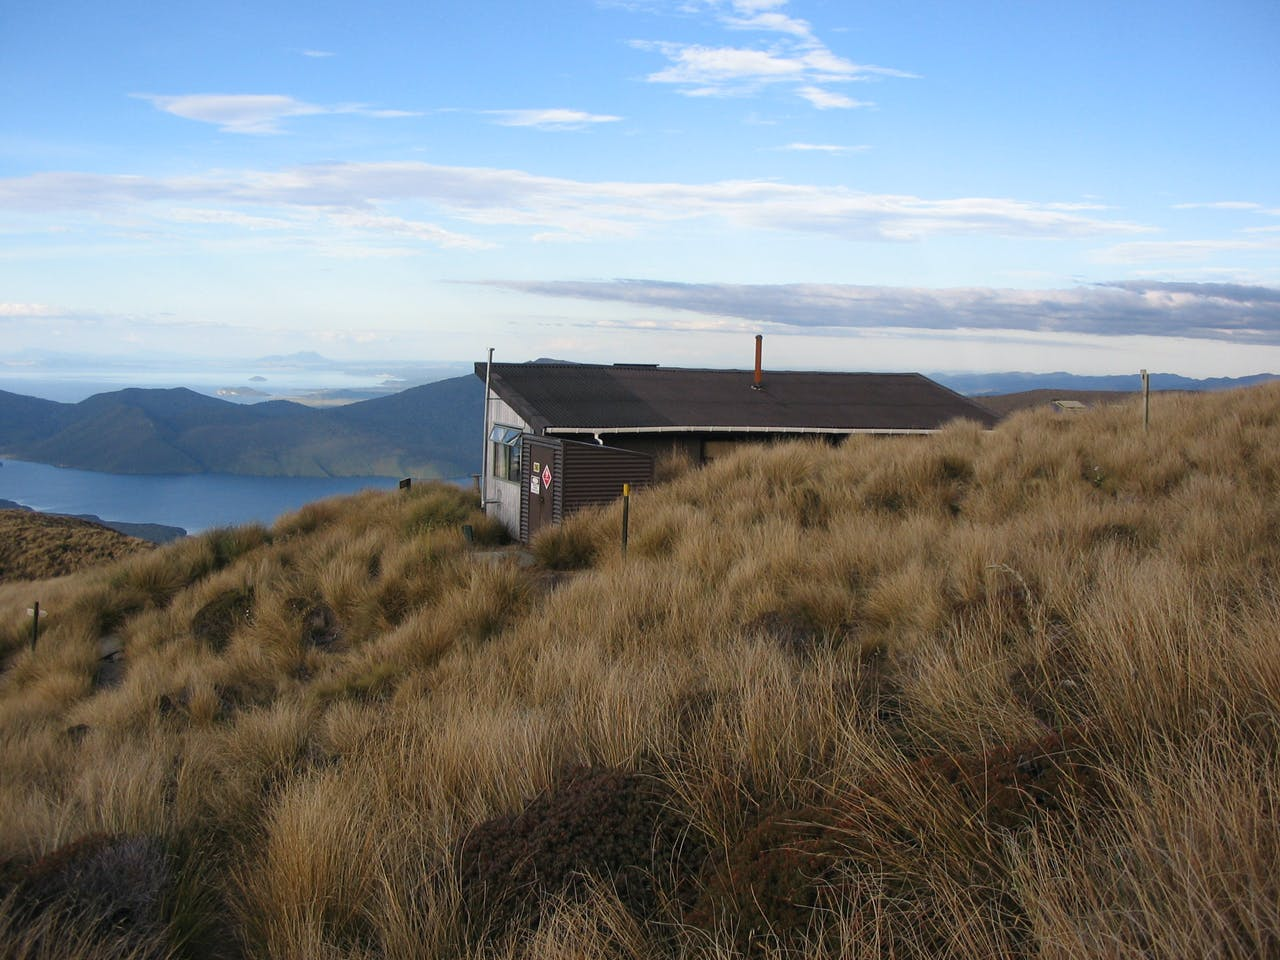 Ketetahi Hut, Tongariro National Park. Photo: Jimmy Johnson